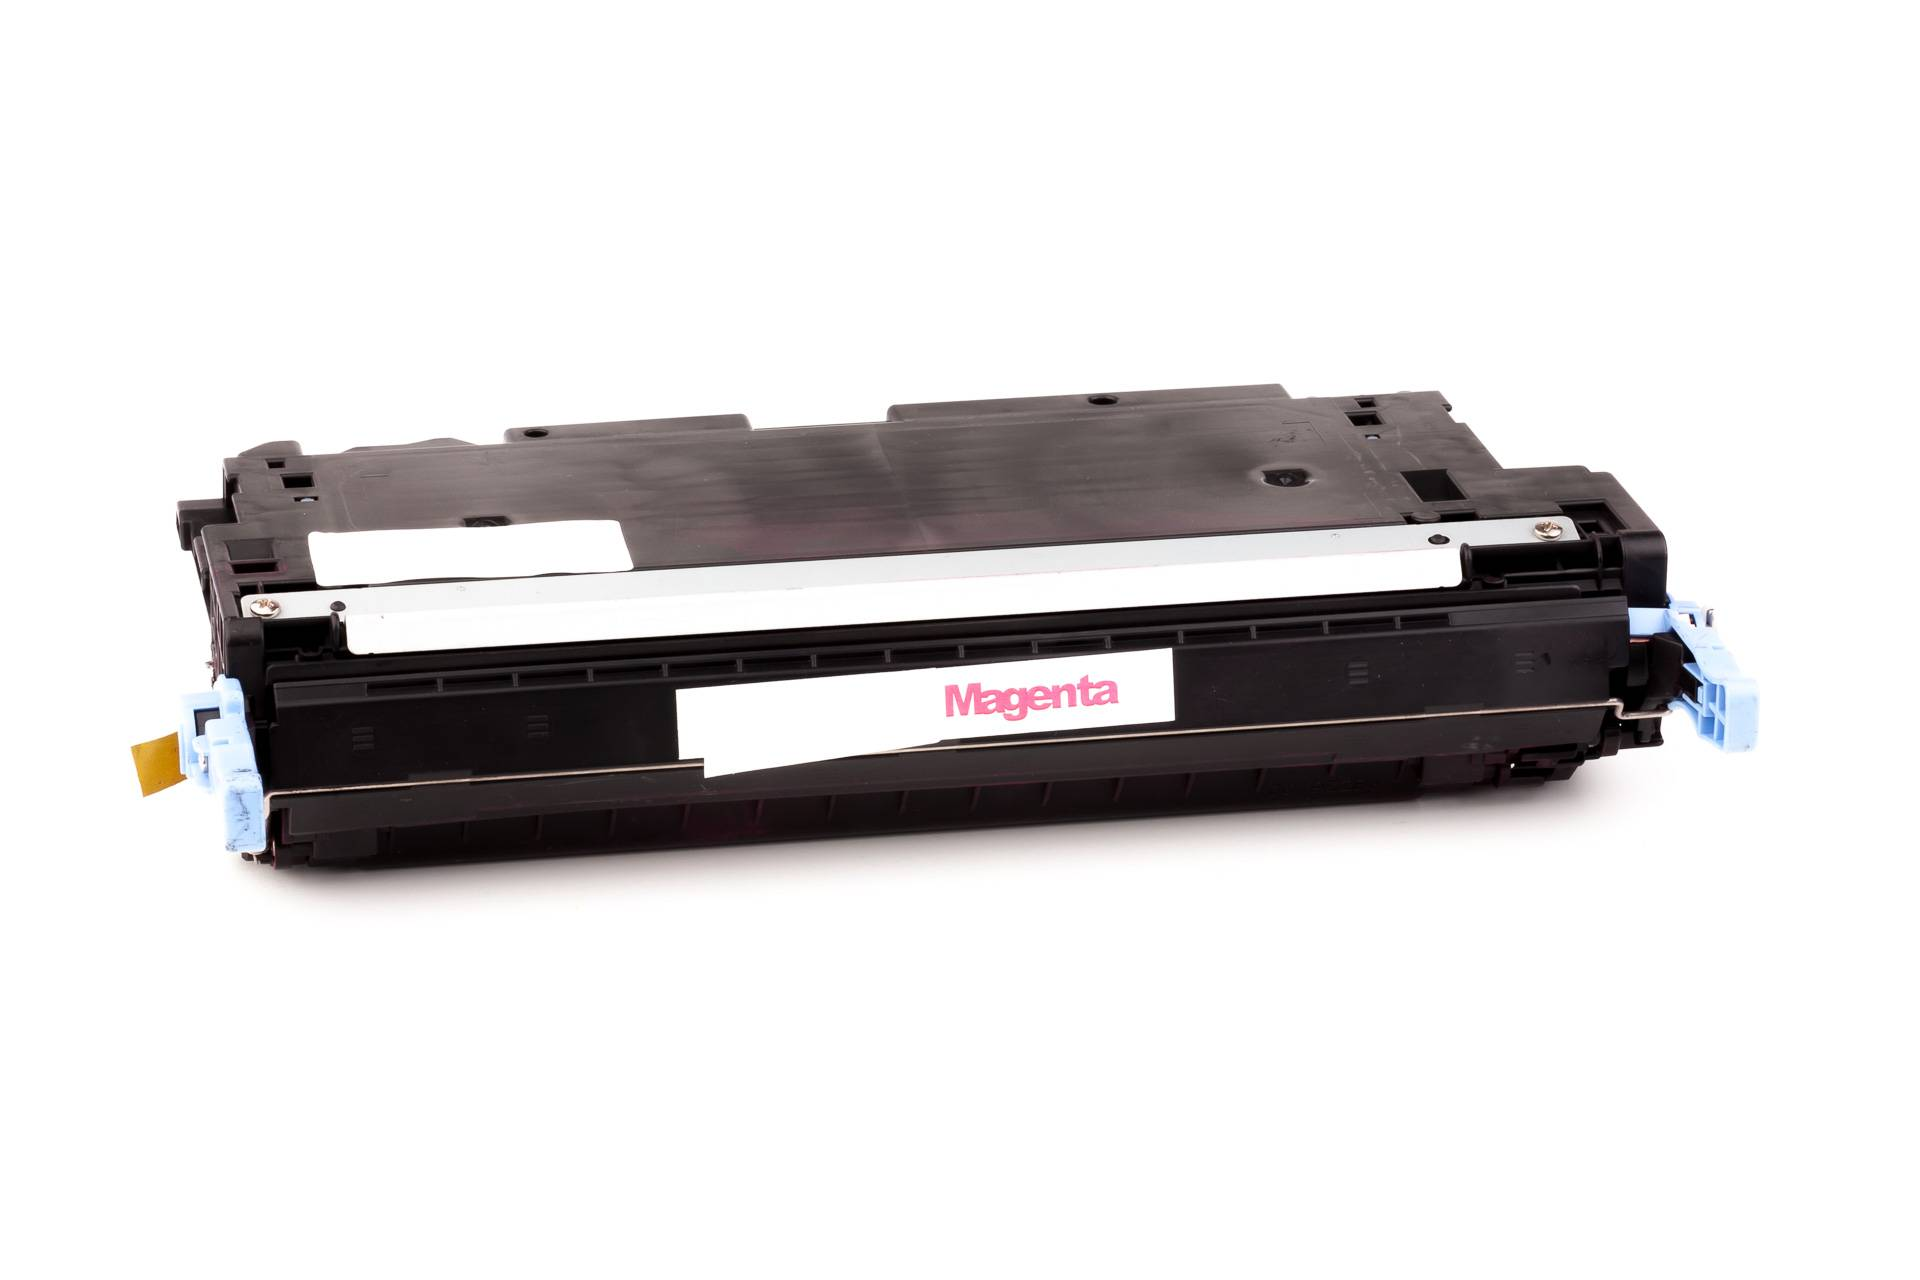 HP Cartouche de Toner pour HP Q7563A / 314A magenta compatible (de marque ASC)